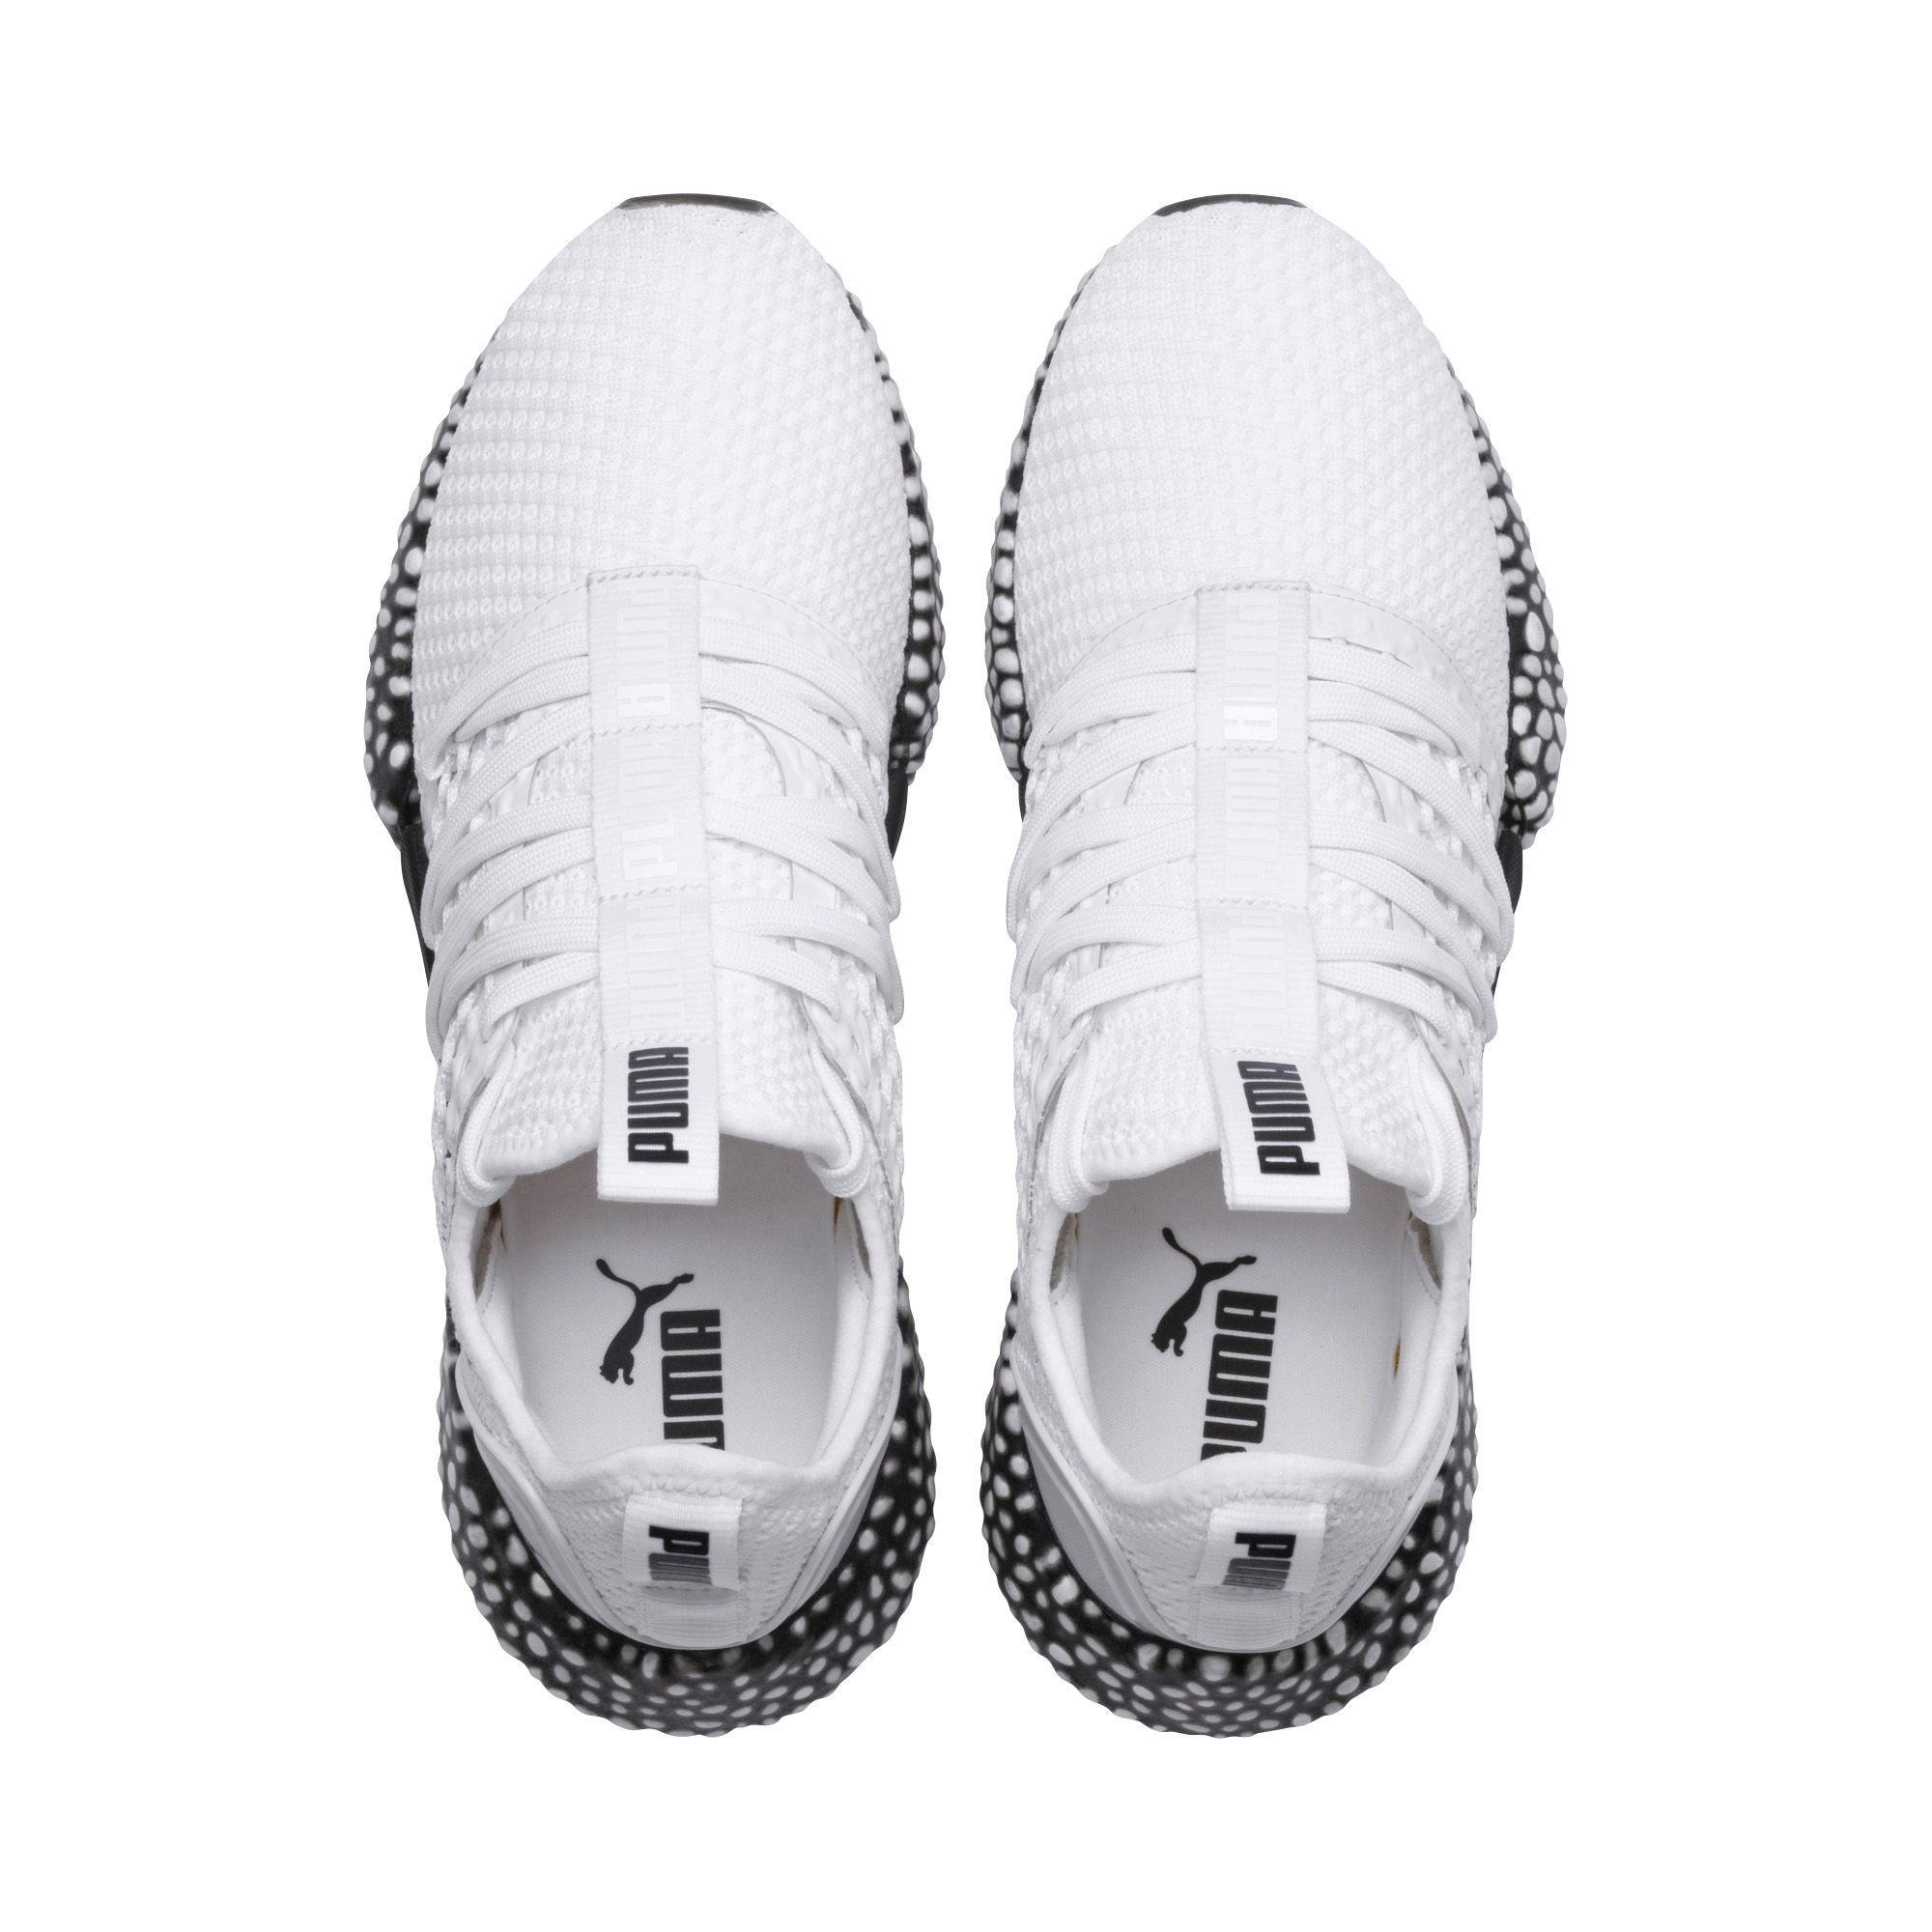 7c2f5ff4d2e324 ... low price lyst puma hybrid rocket netfit mens training shoes in white  for men 28ff4 06d14